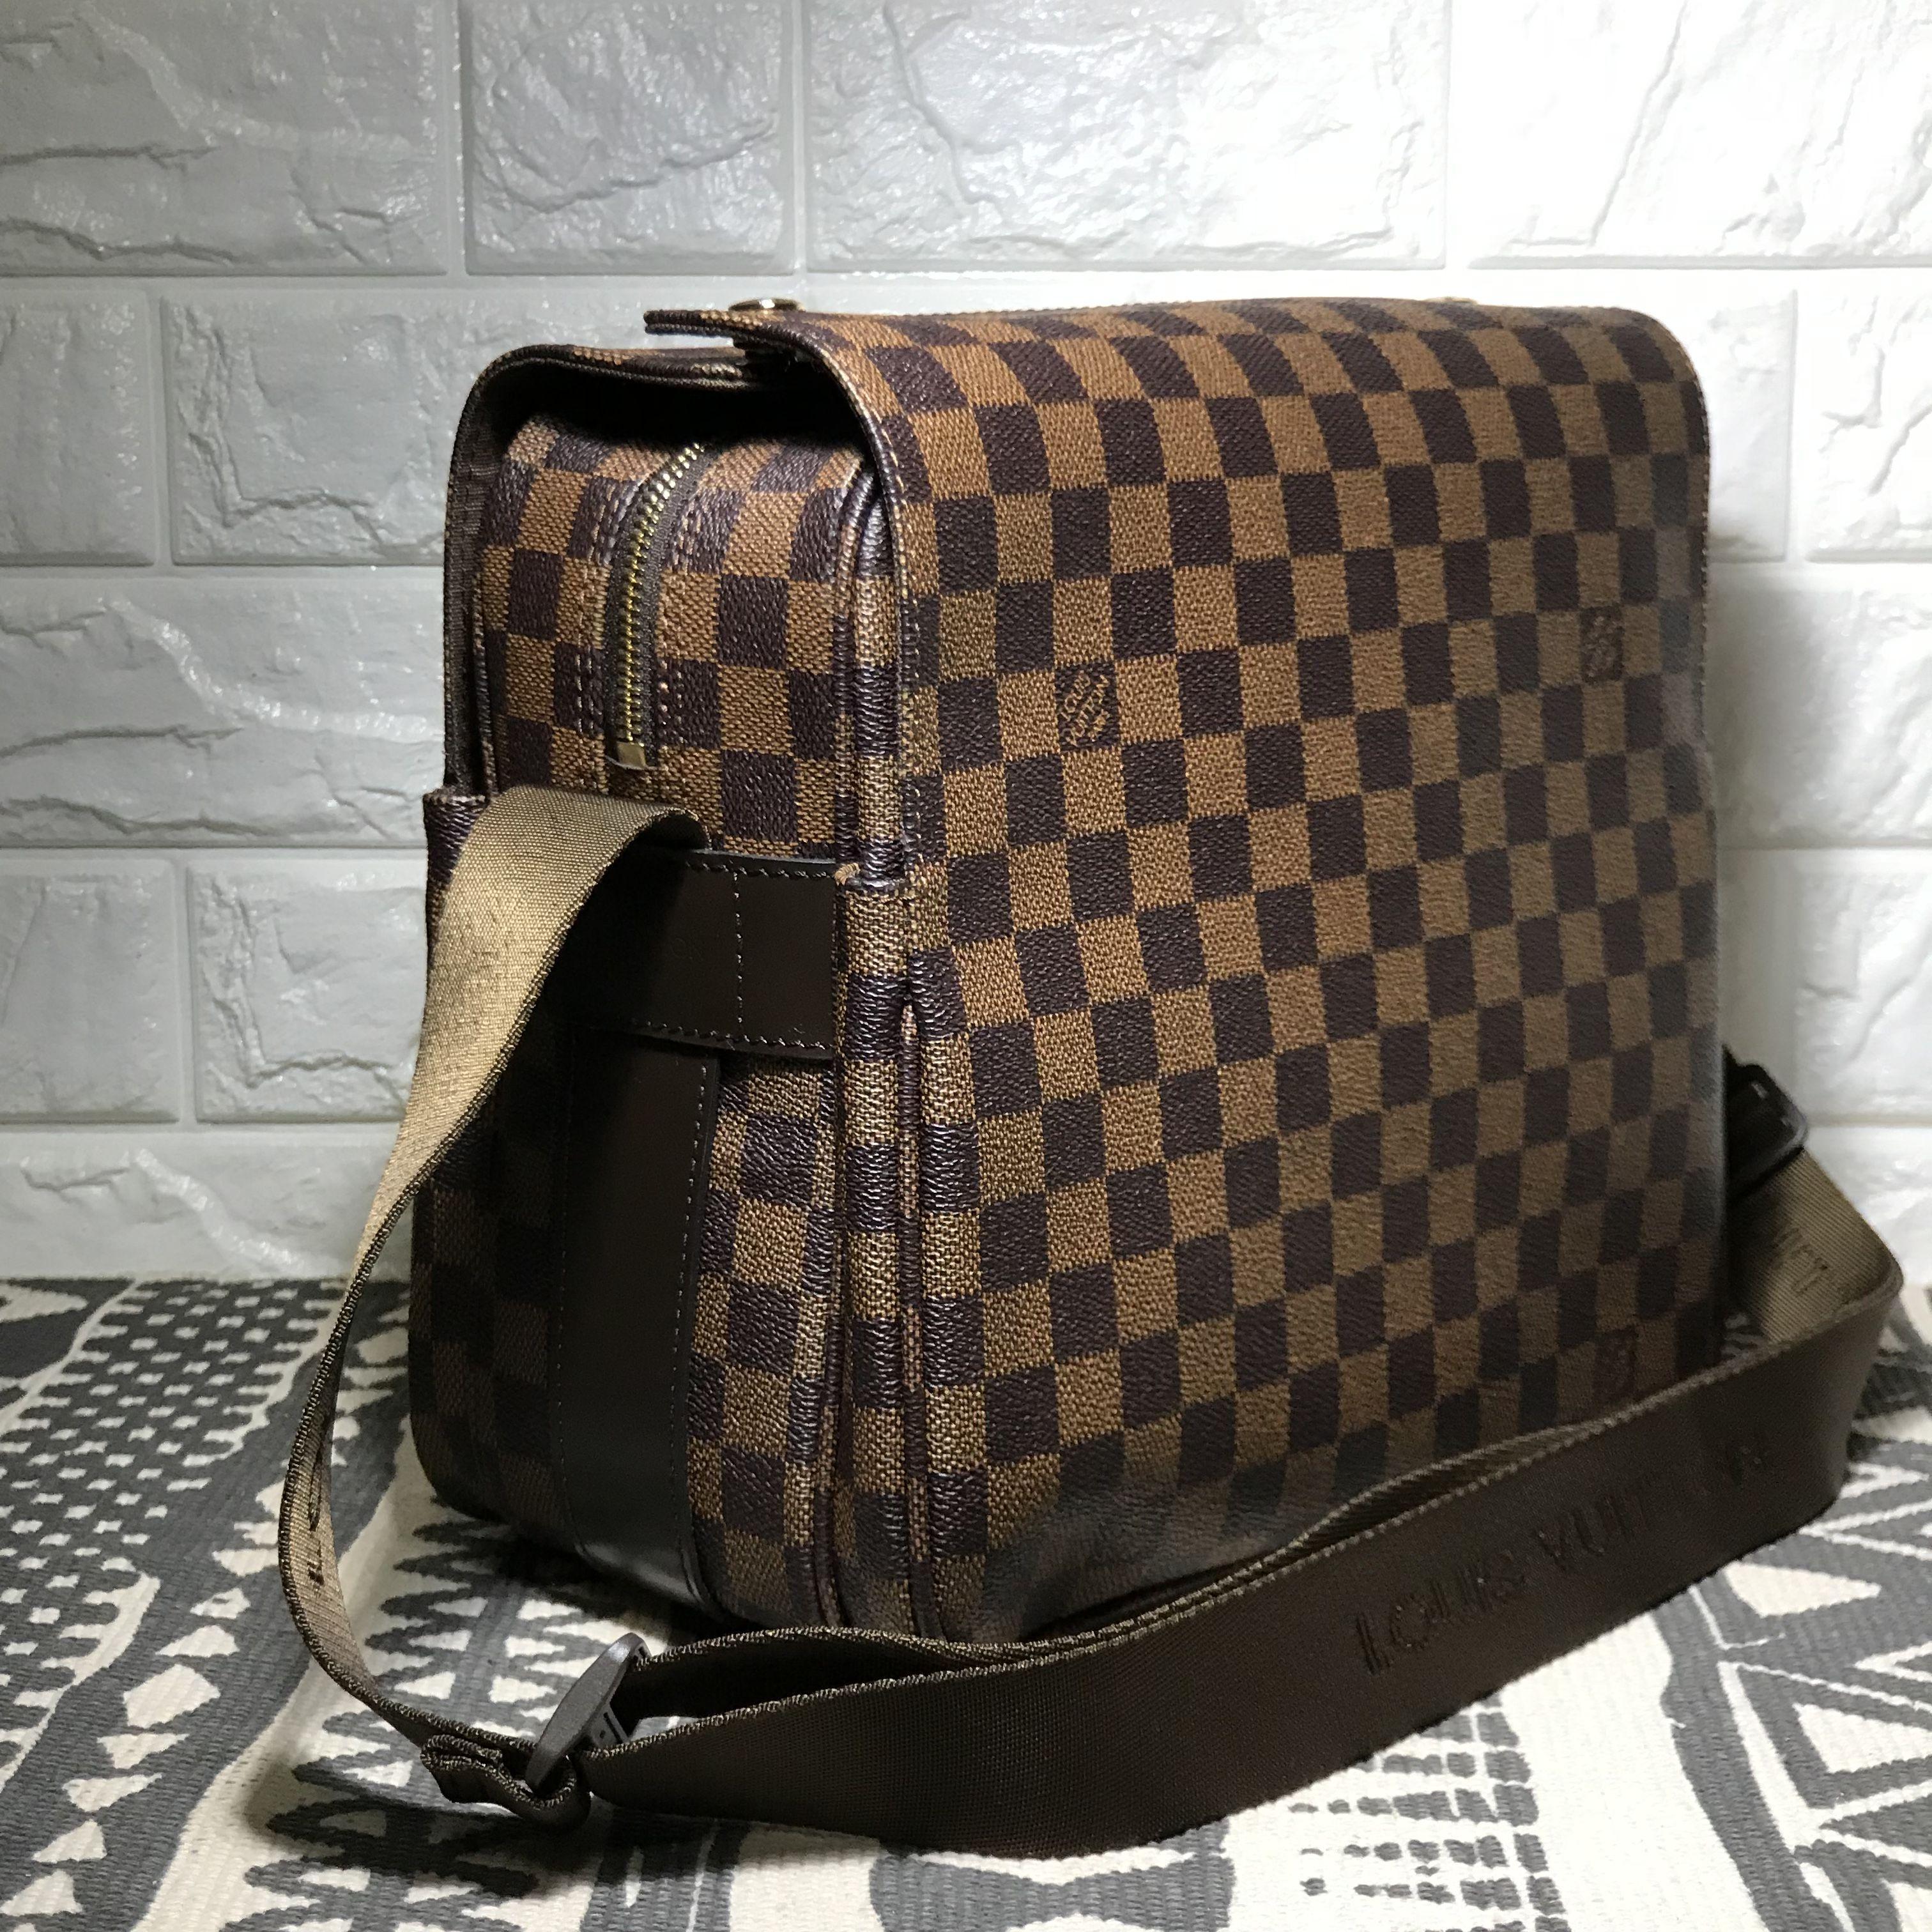 Louis Vuitton Lv Man Messenger Bag Damier Ebene Messenger Bag Men Louis Vuitton Mens Travel Bag